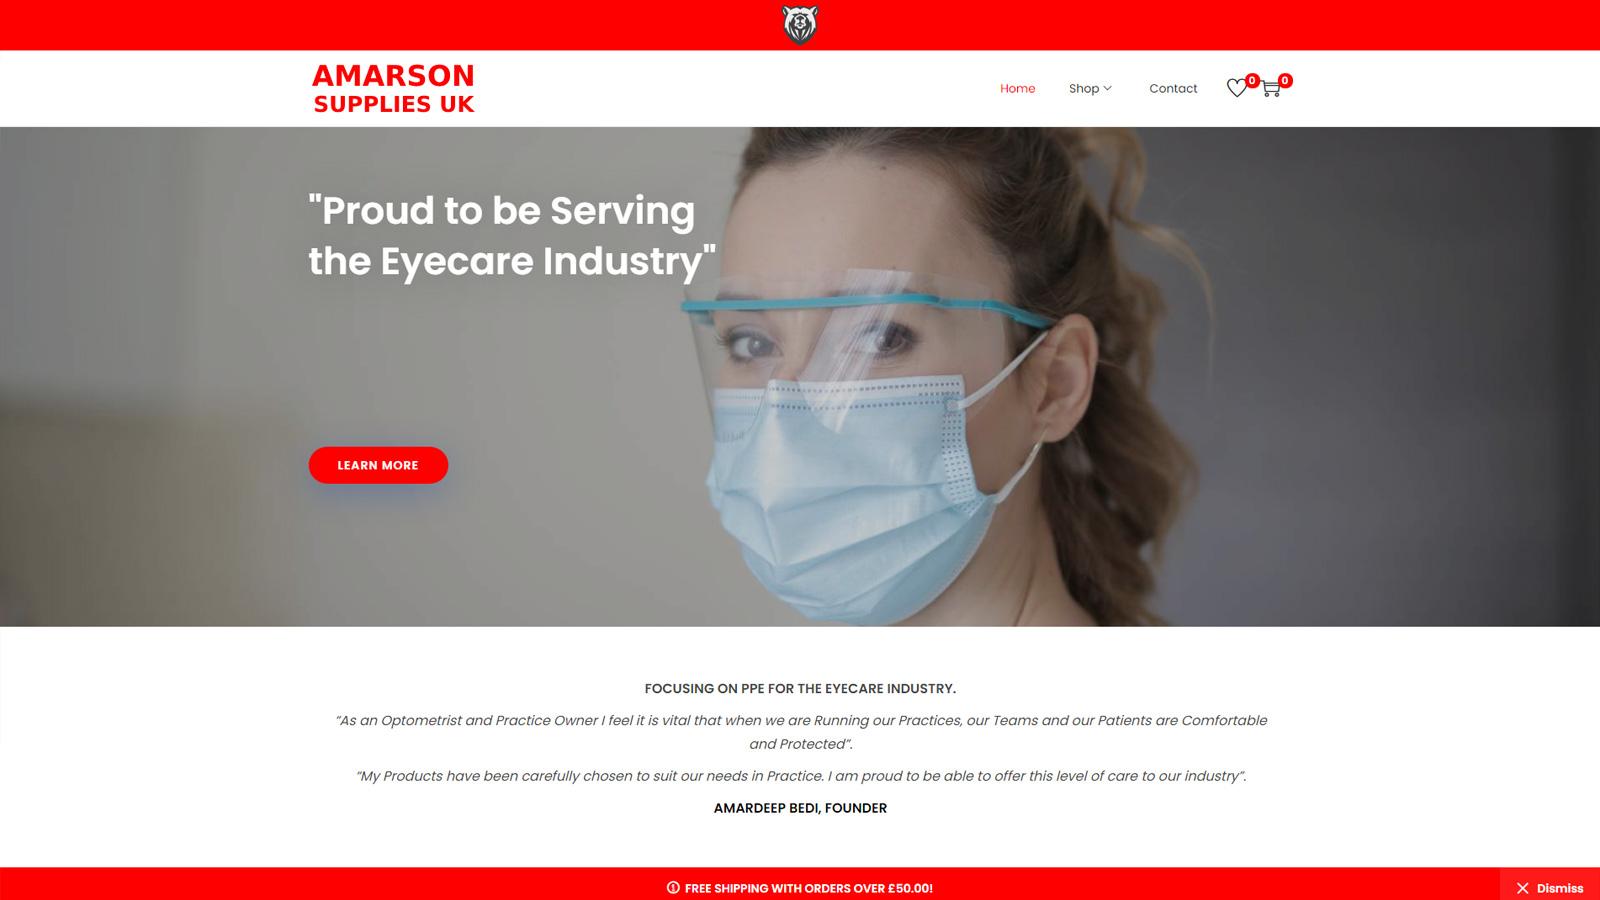 farook kholwadia developer keighley amarson supplies